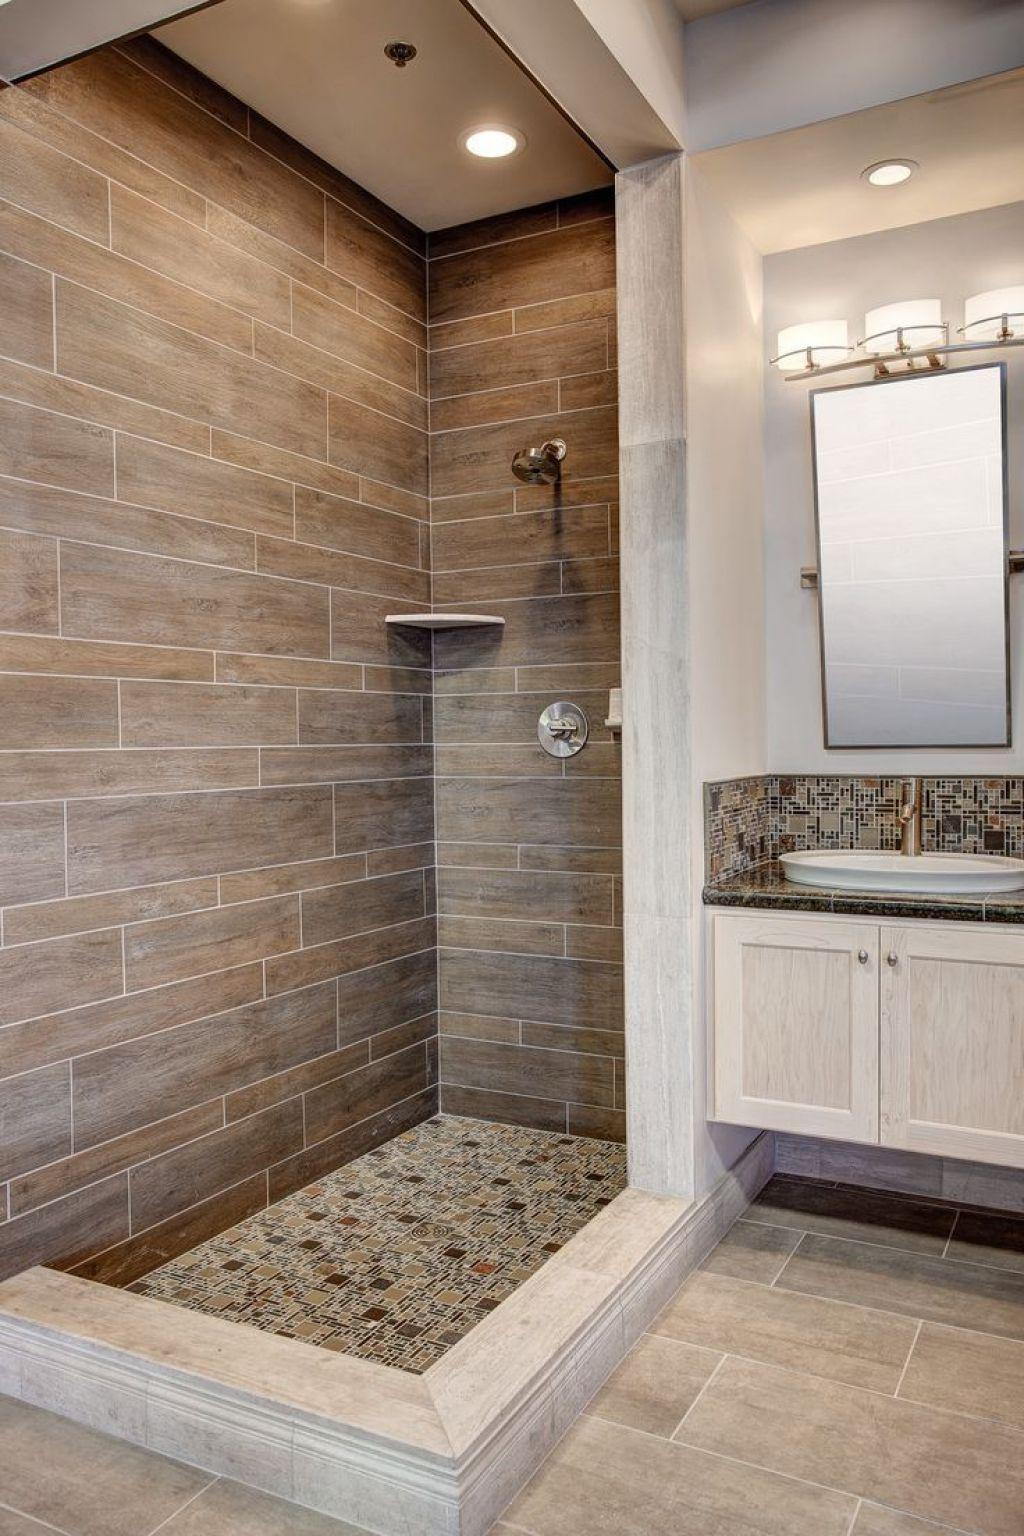 Instructions To Retile A Bathroom Wall Tiny House Bathroom